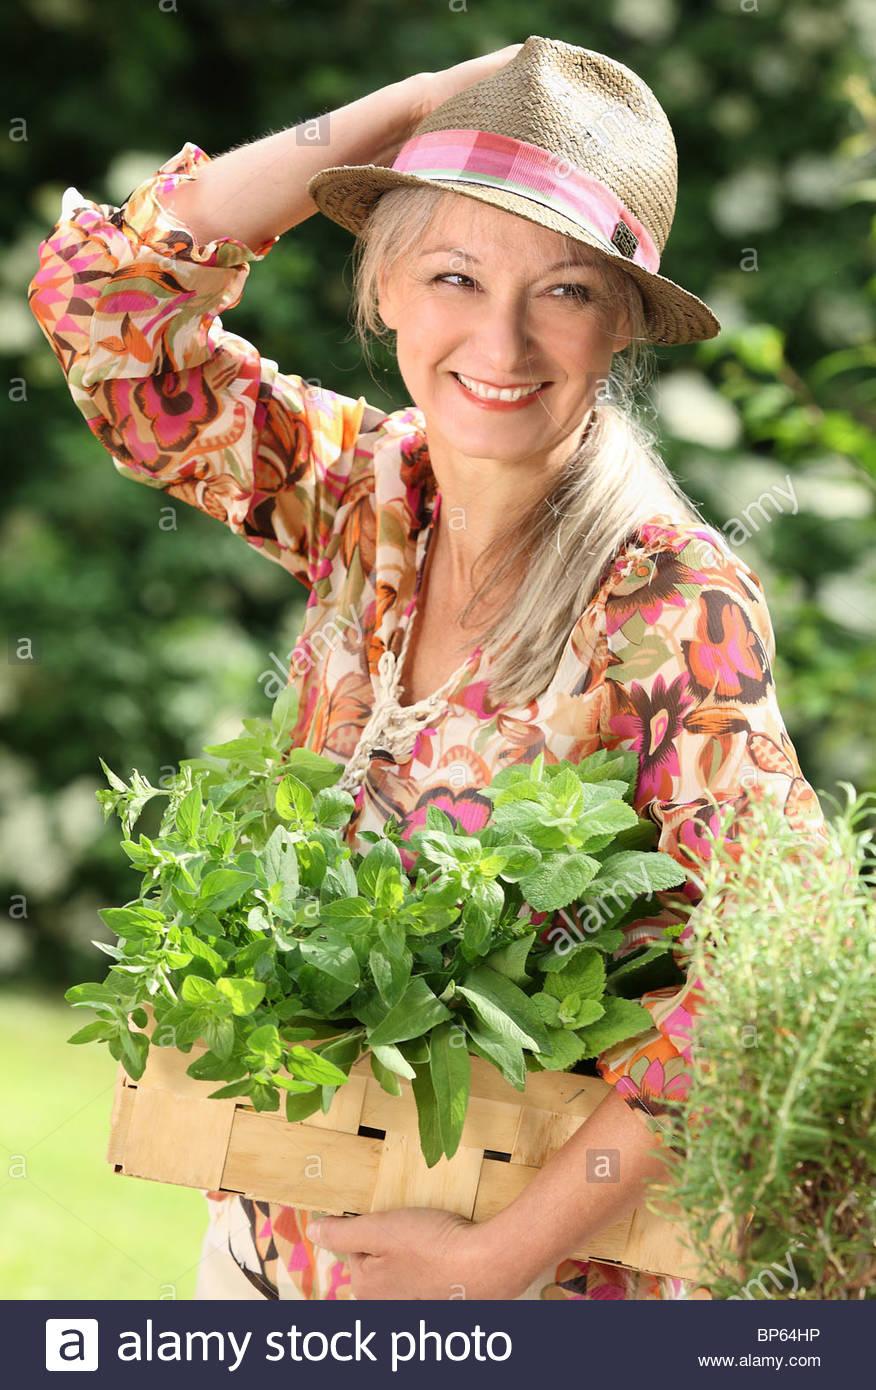 older woman picking fresh herbs Stock Photo: 30868146 - Alamy